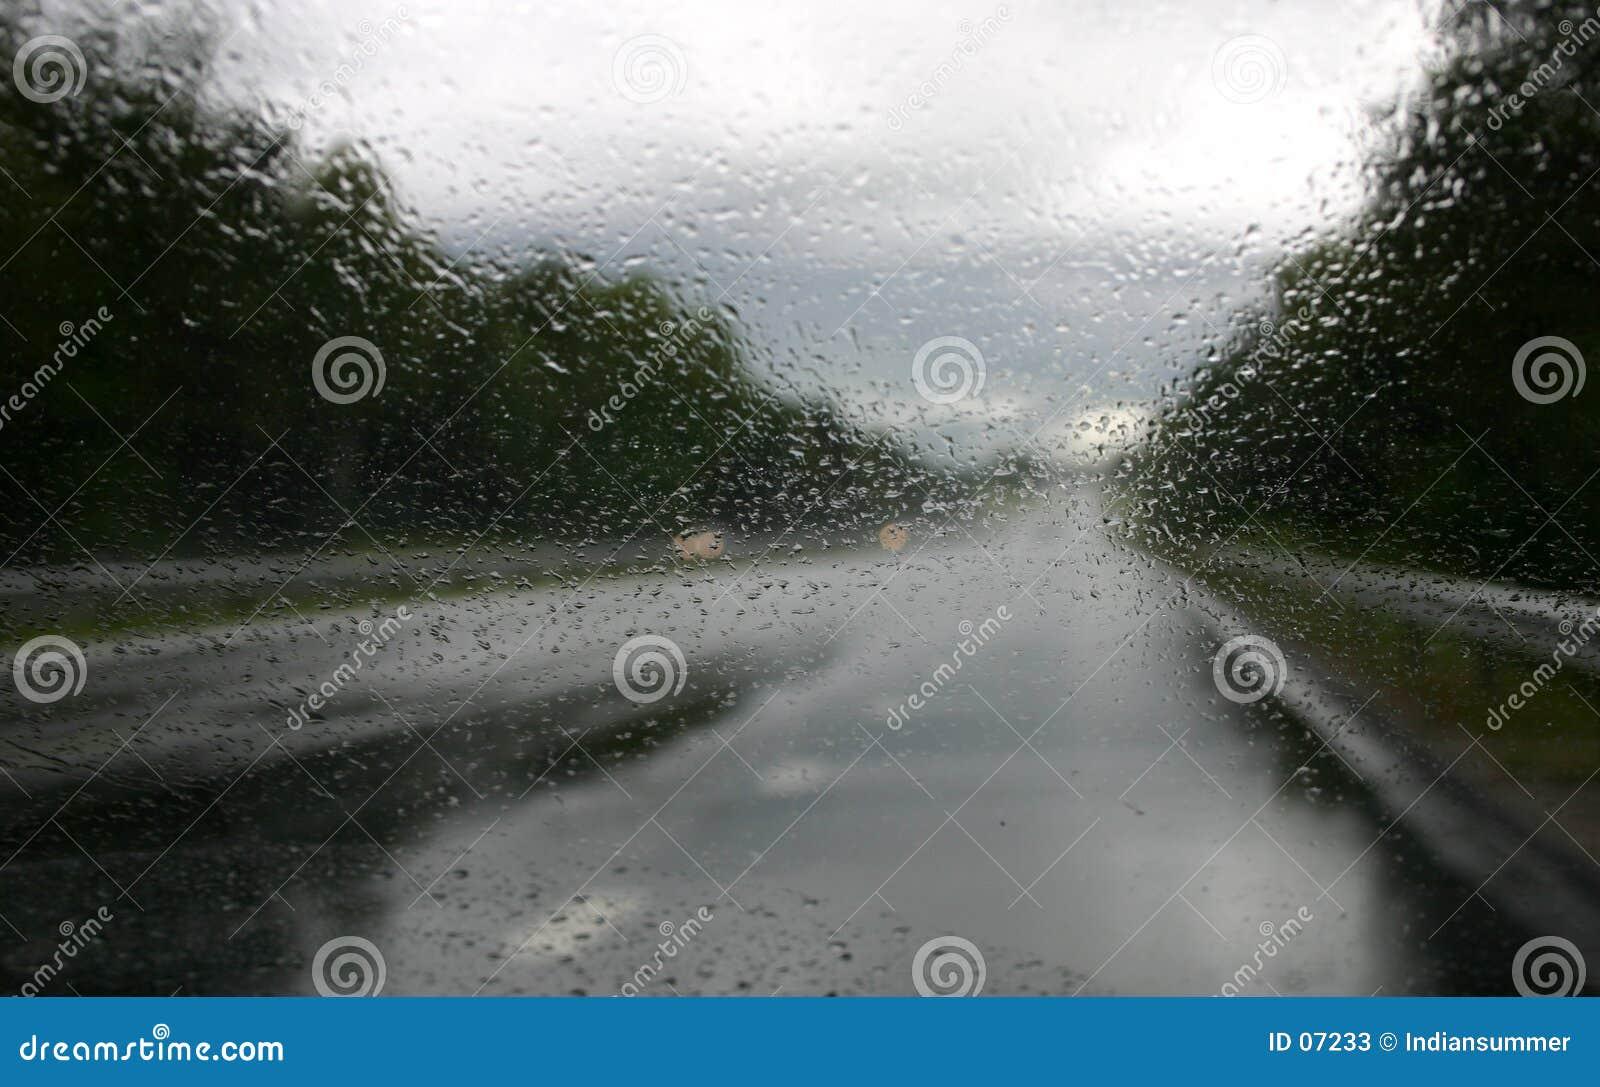 Driving in the rain V